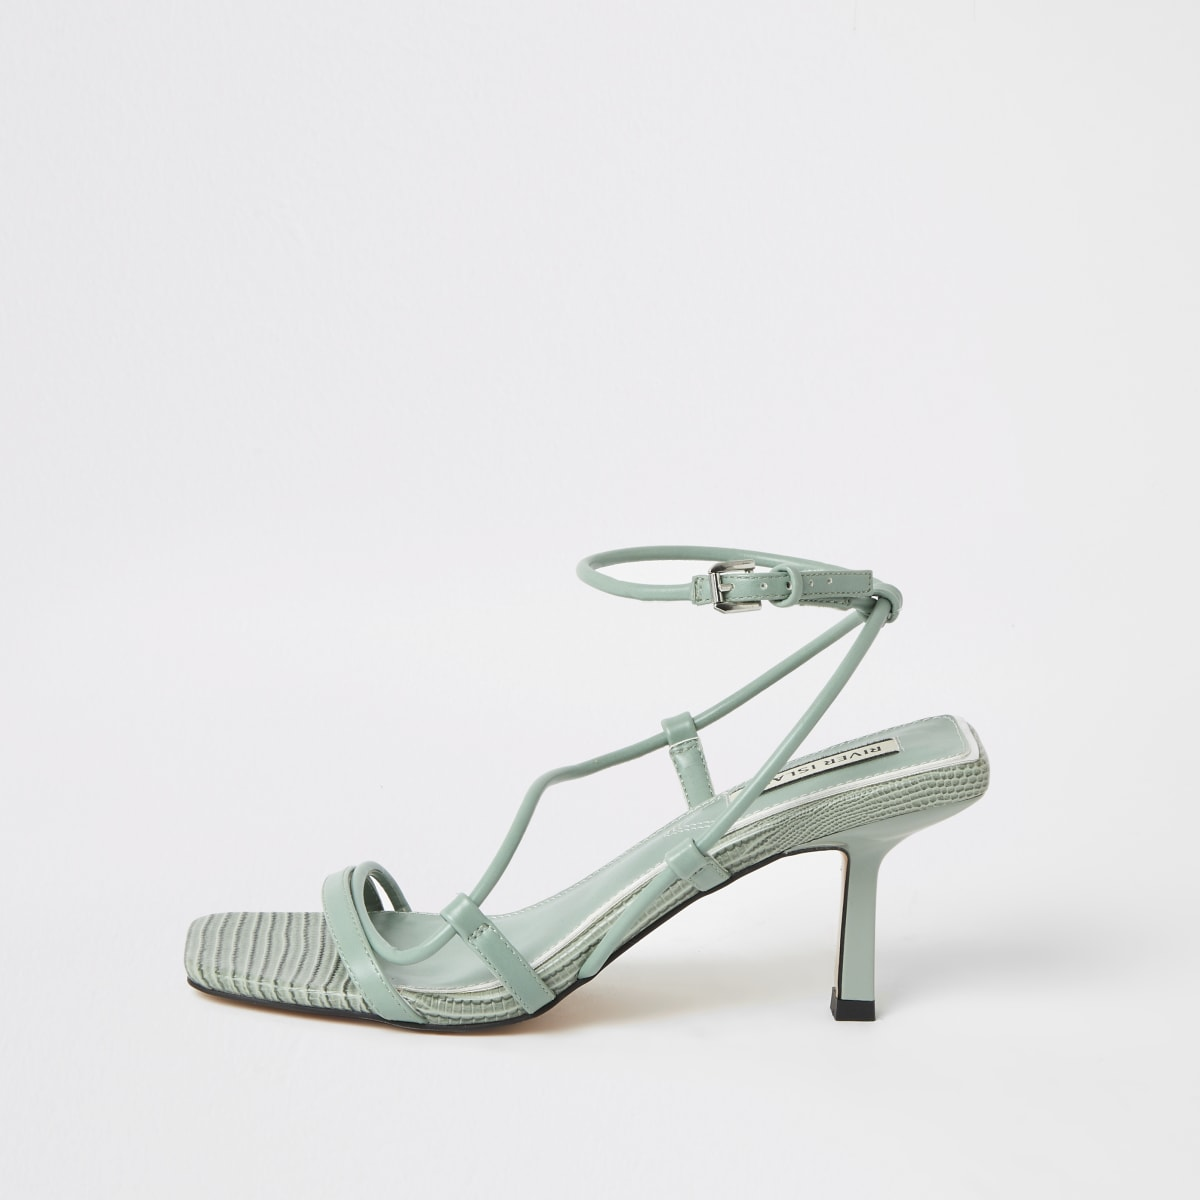 Green square toe midi heel sandals